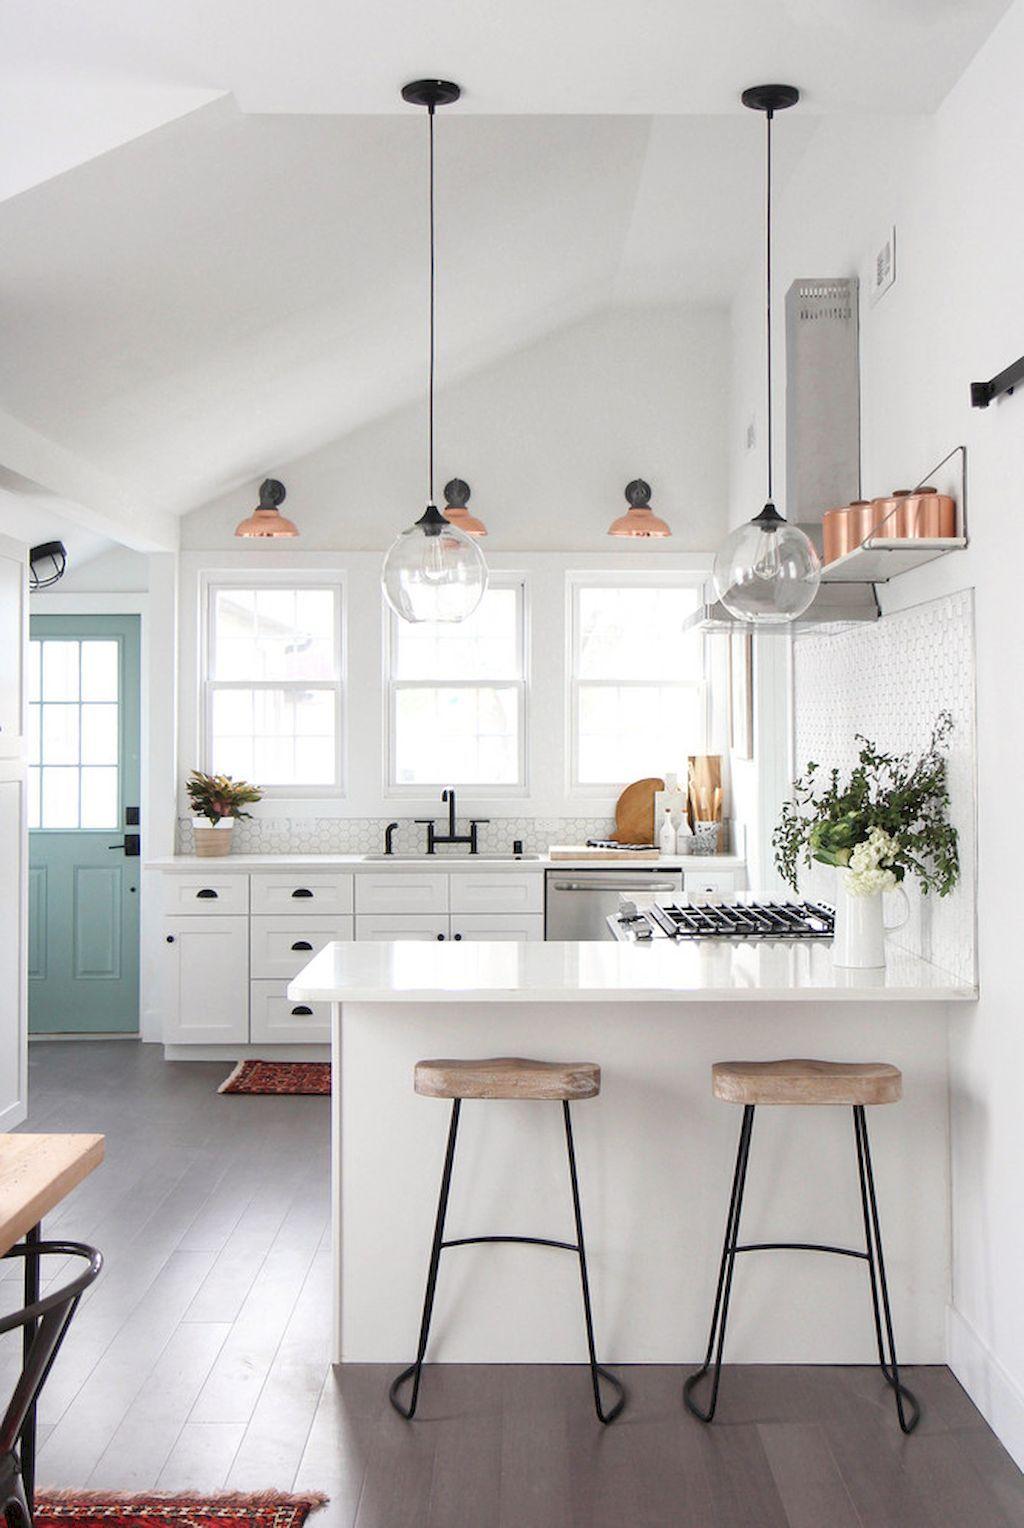 50 Stunning Small Kitchen Design Ideas   Organisation ideas, Storage ...